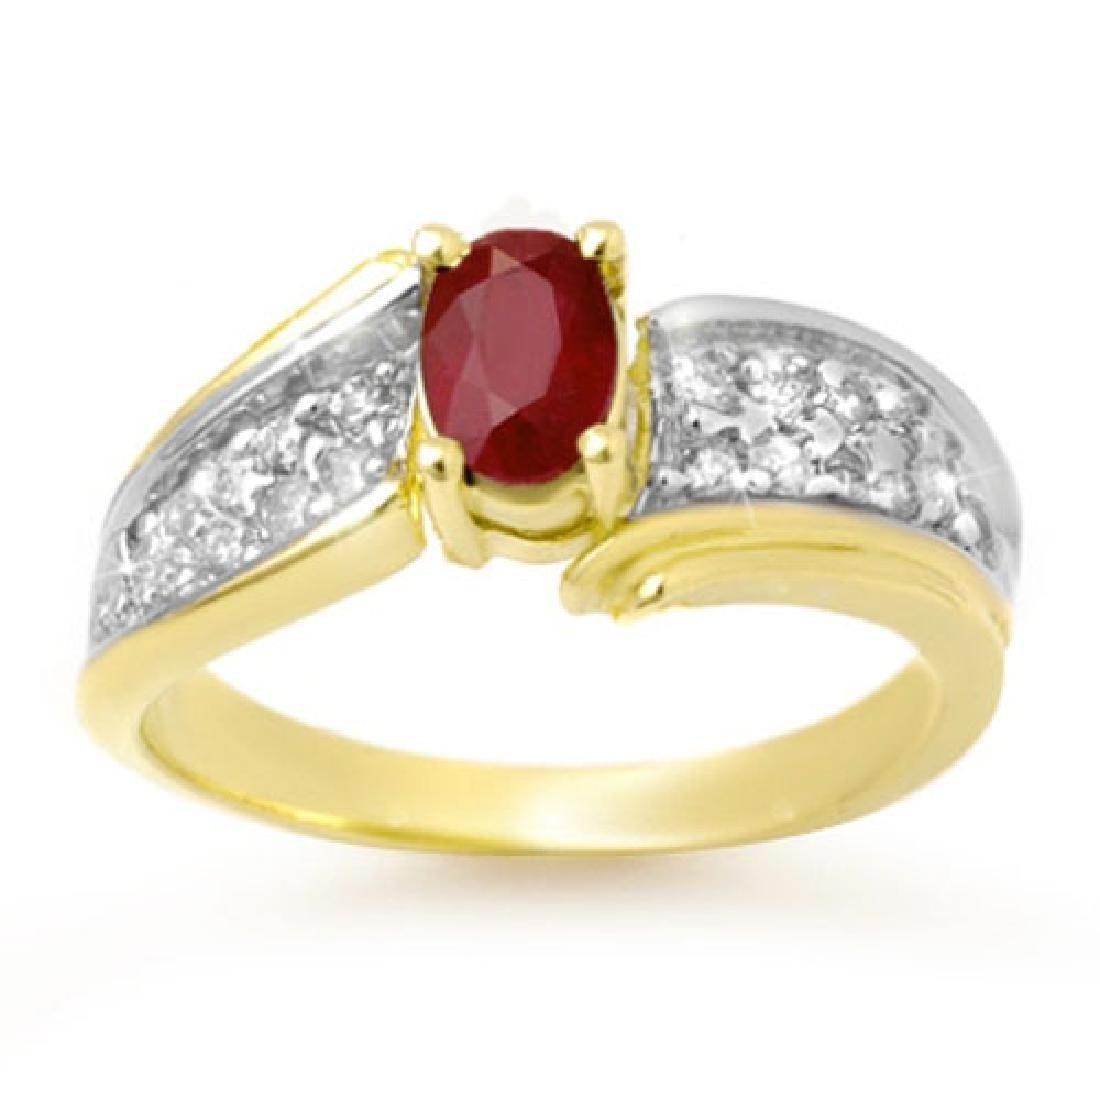 1.43 CTW Ruby & Diamond Ring 10K Yellow Gold